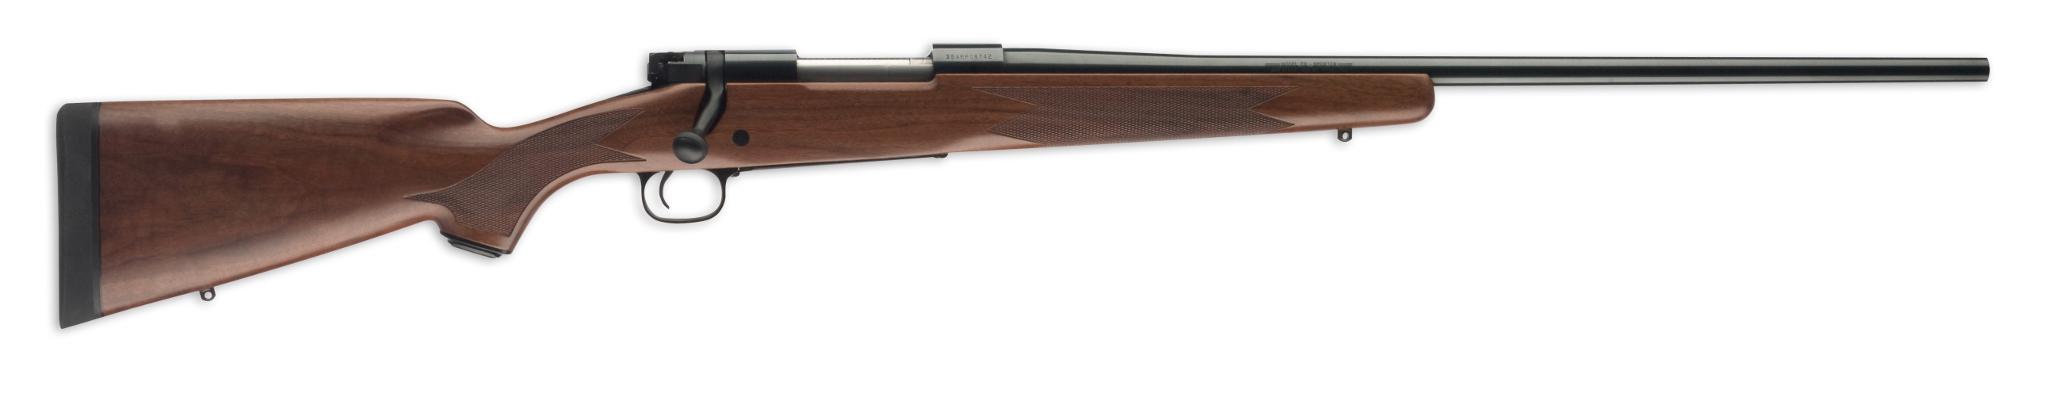 Winchester Model 70 Sporter rifle